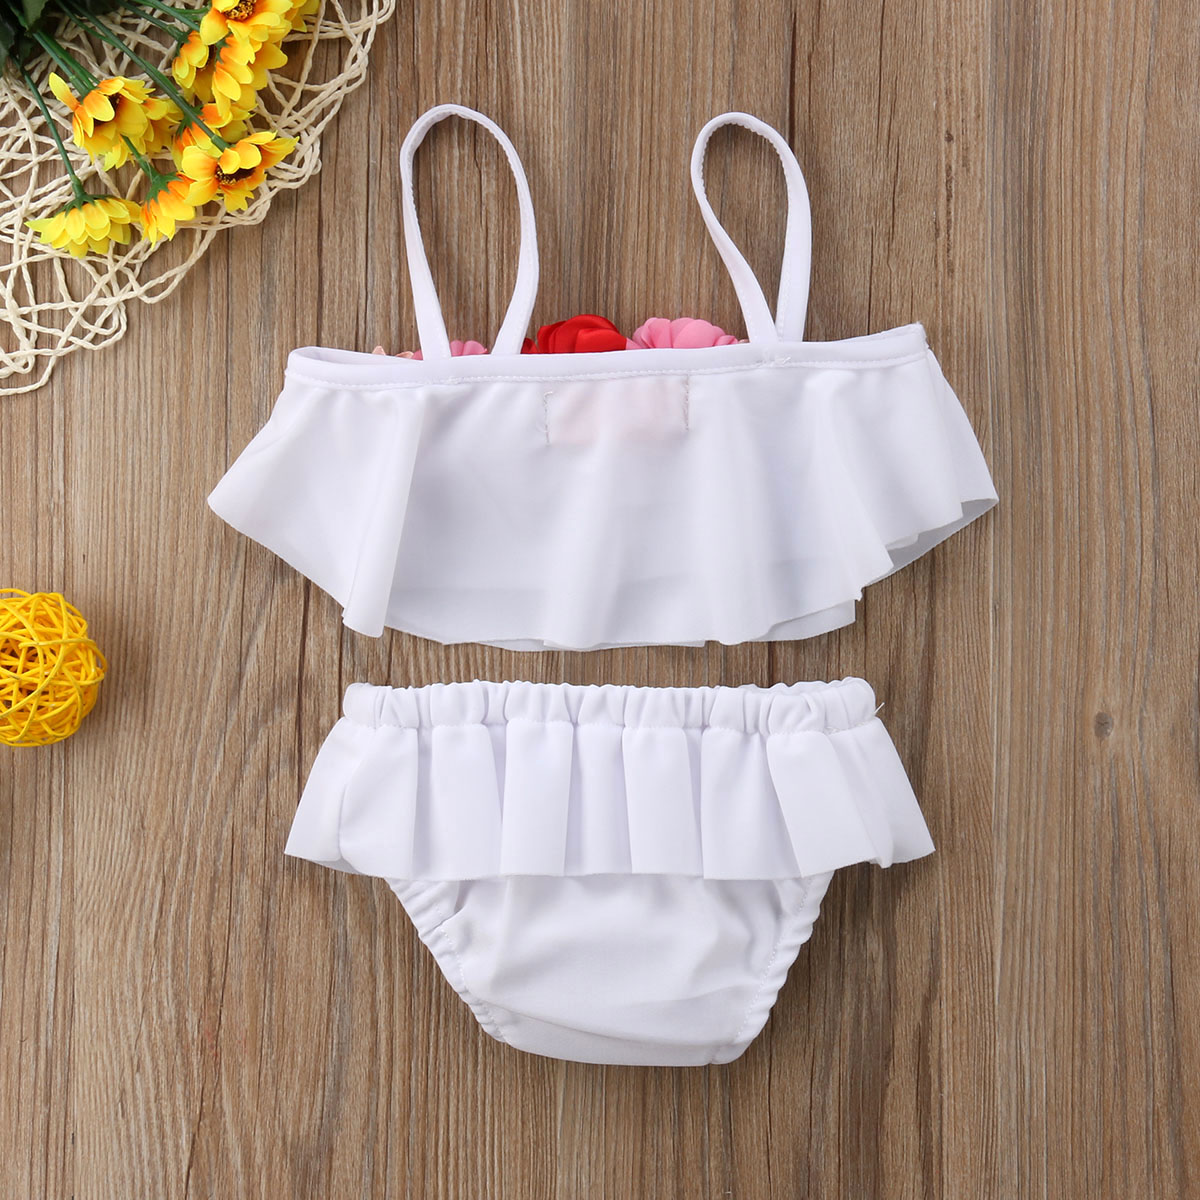 2Pcs Summer Kid Baby Girl Floral White Swimming Bikini Clothing Set Swimsuit Swimwear Bathing Suit